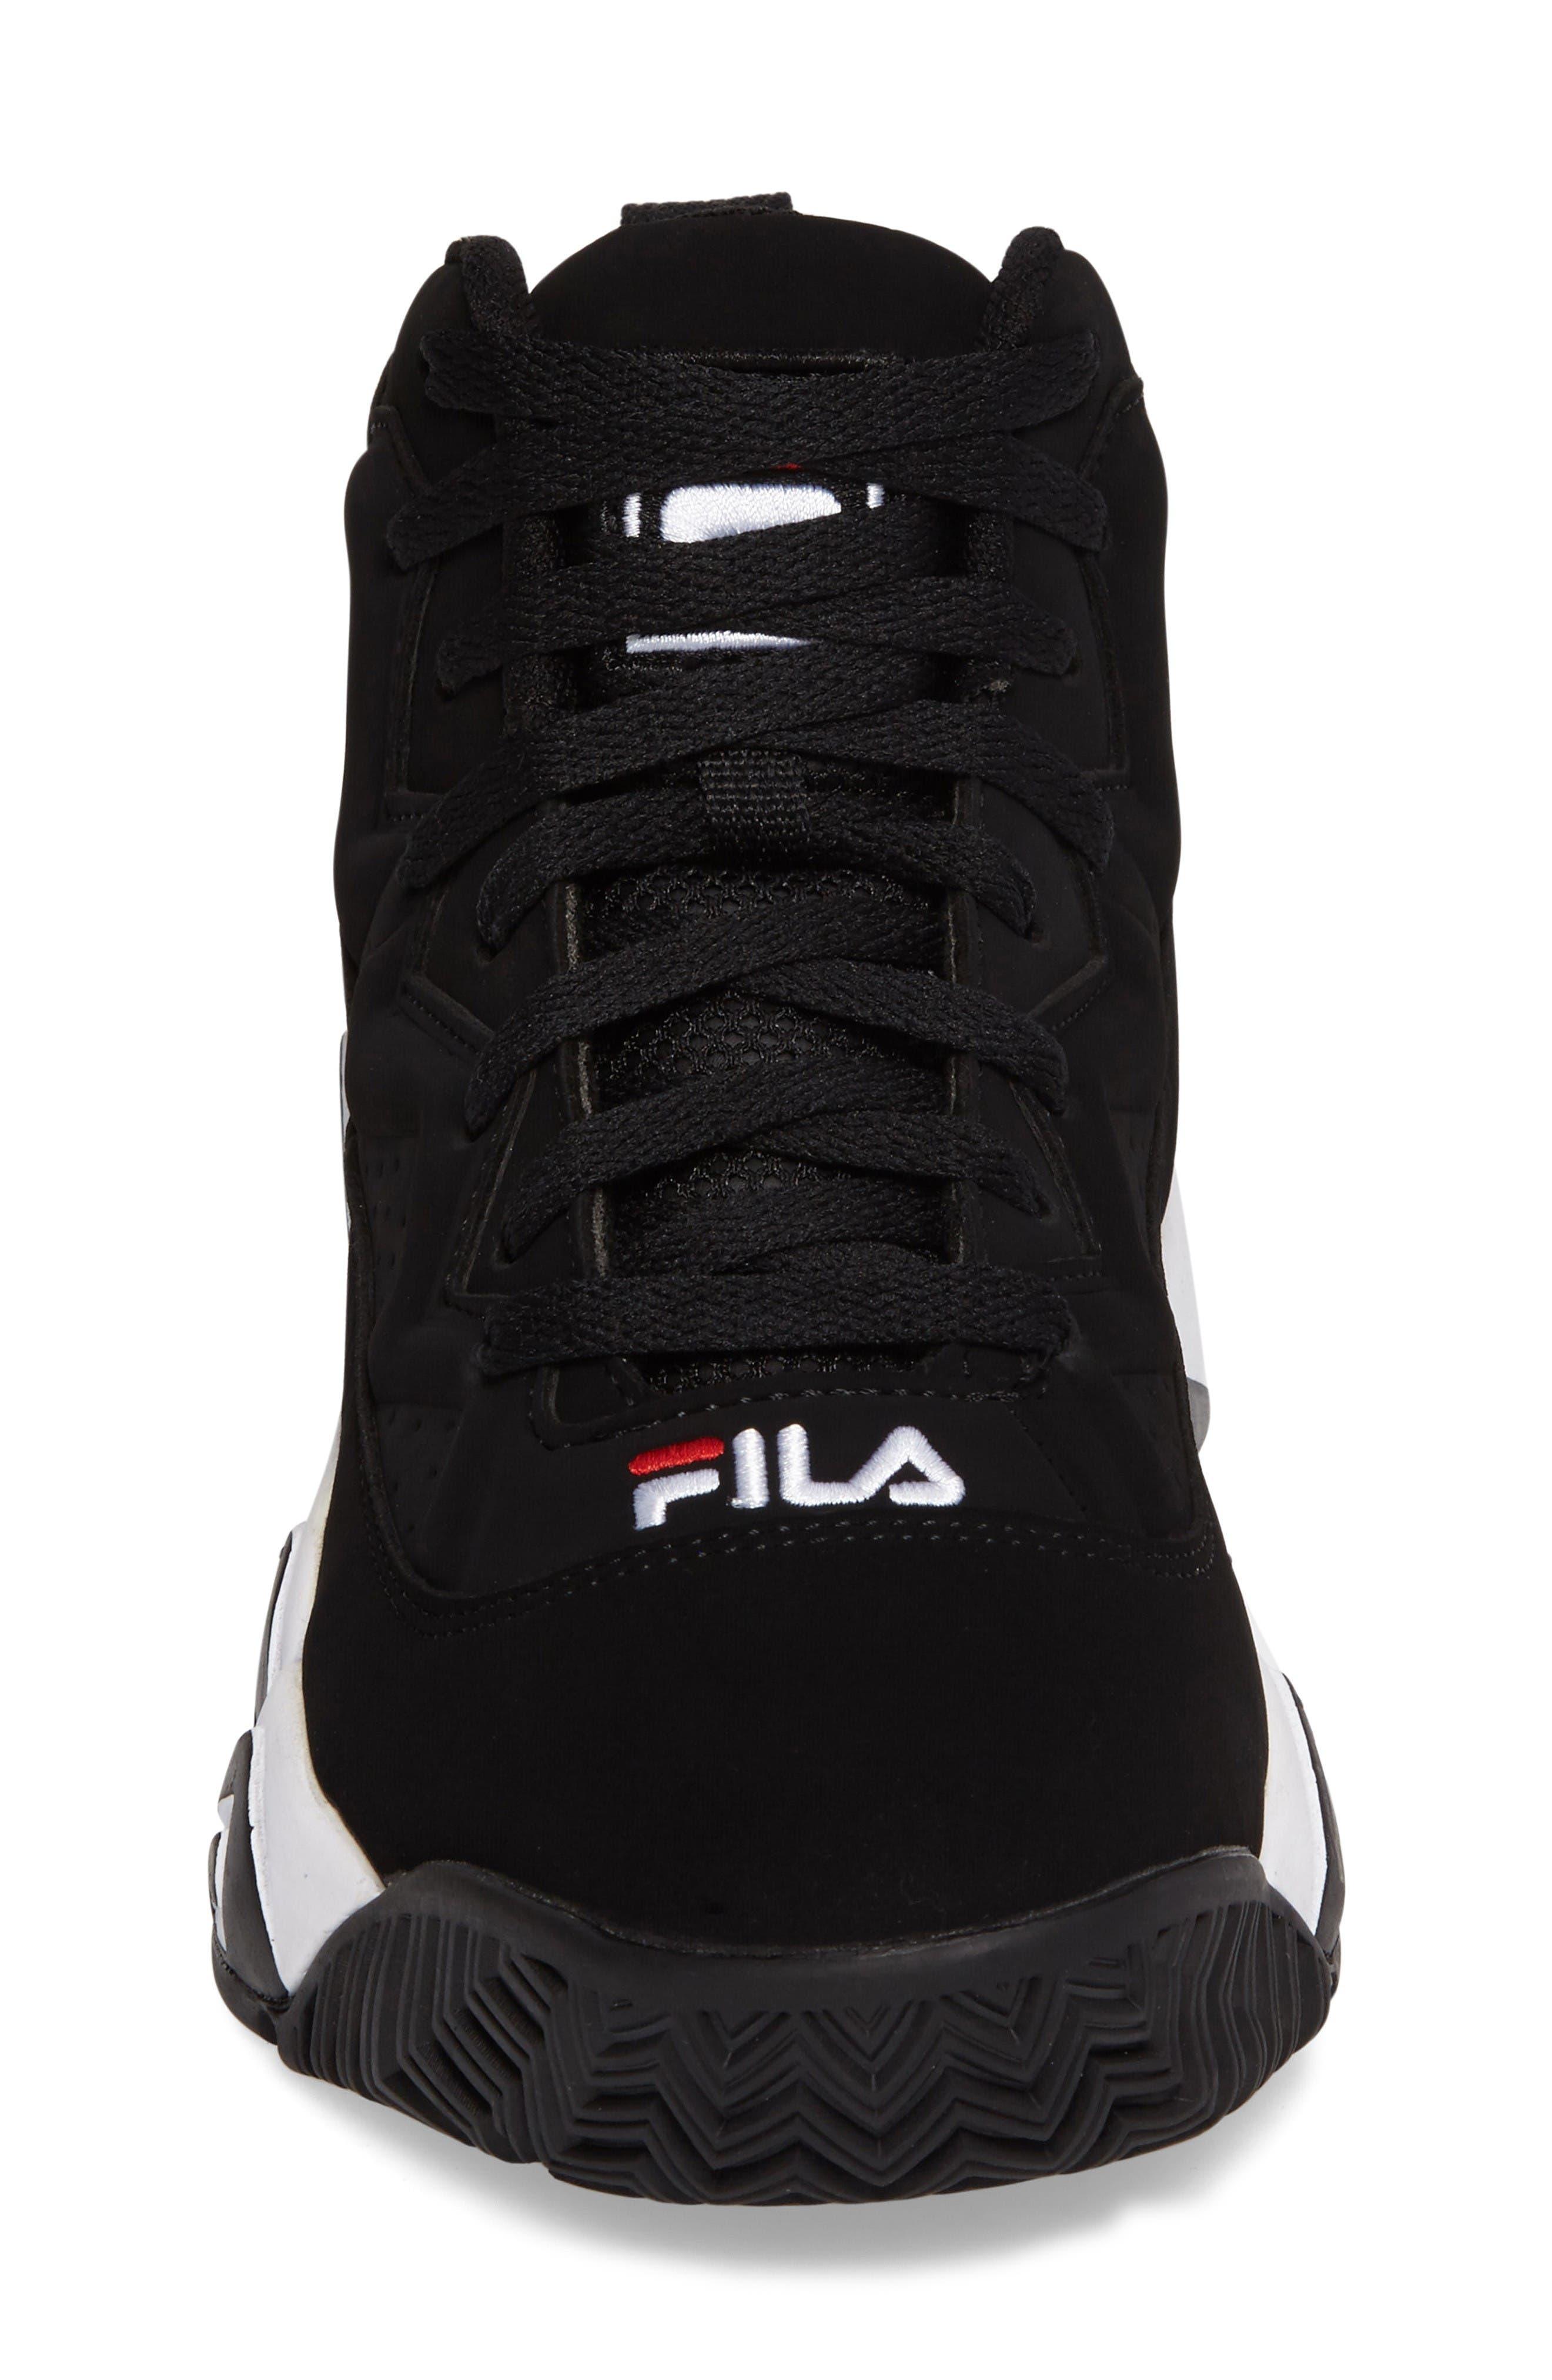 Heritage Sneaker,                             Alternate thumbnail 4, color,                             Black/ White Nubuck Leather